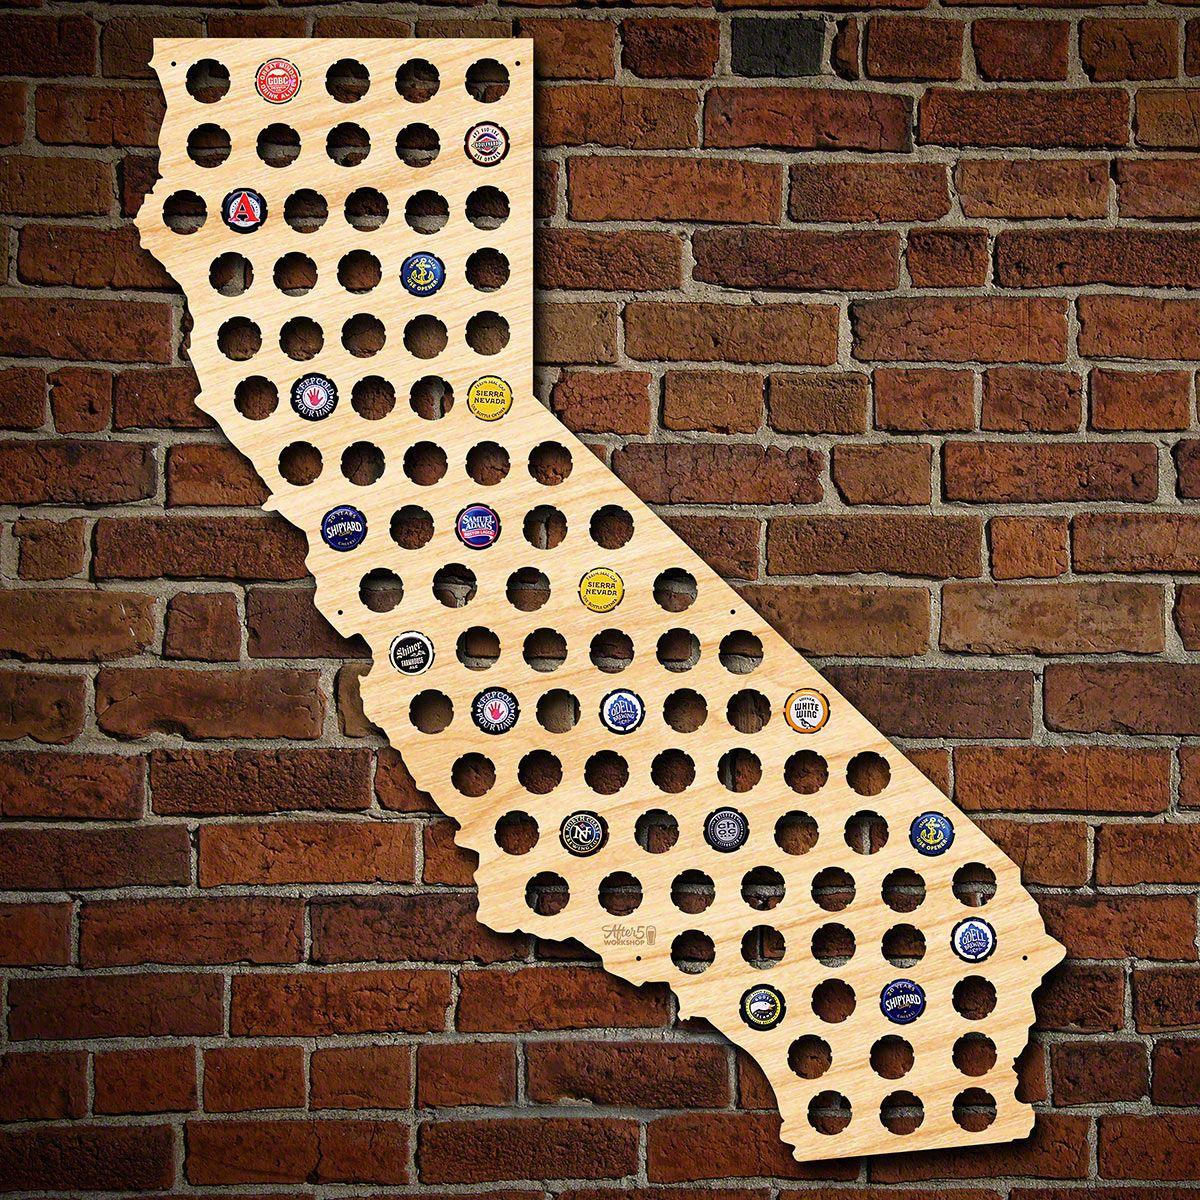 Giant XL California Beer Cap Map